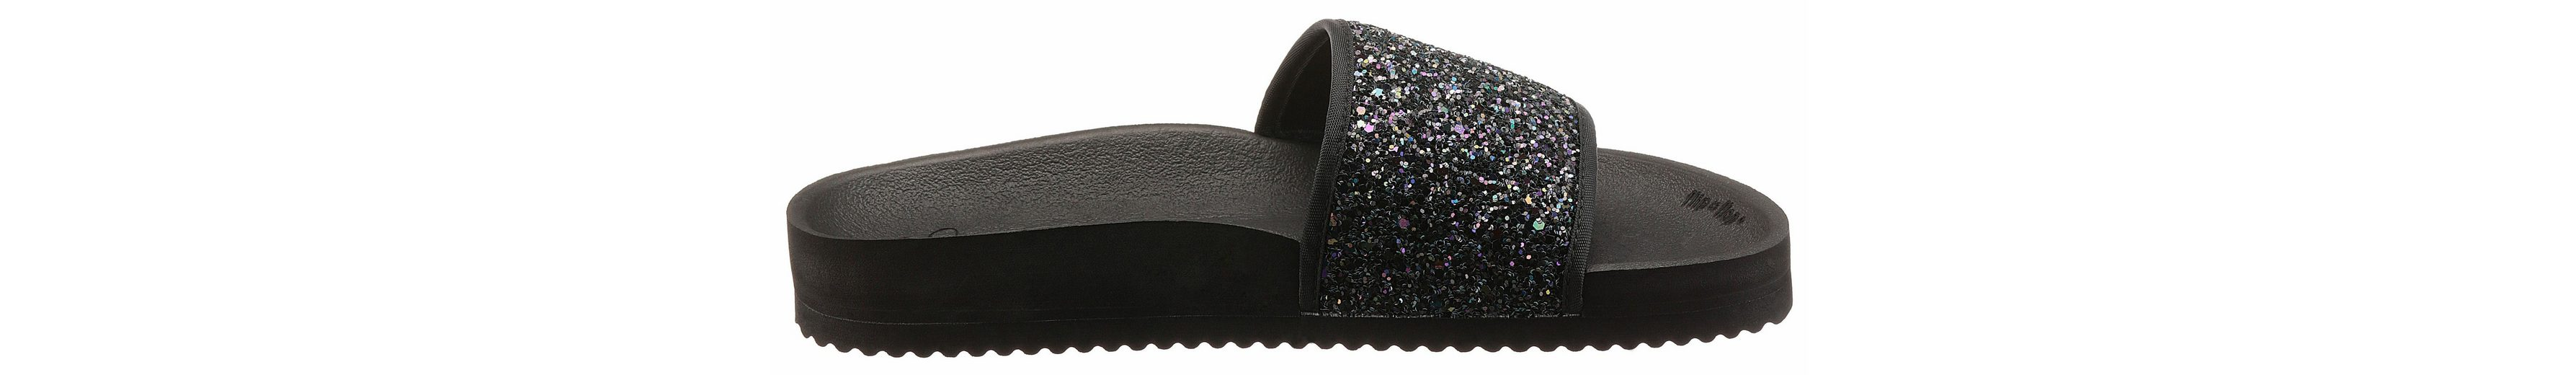 Flip Flop Pantolette, mit Glitter